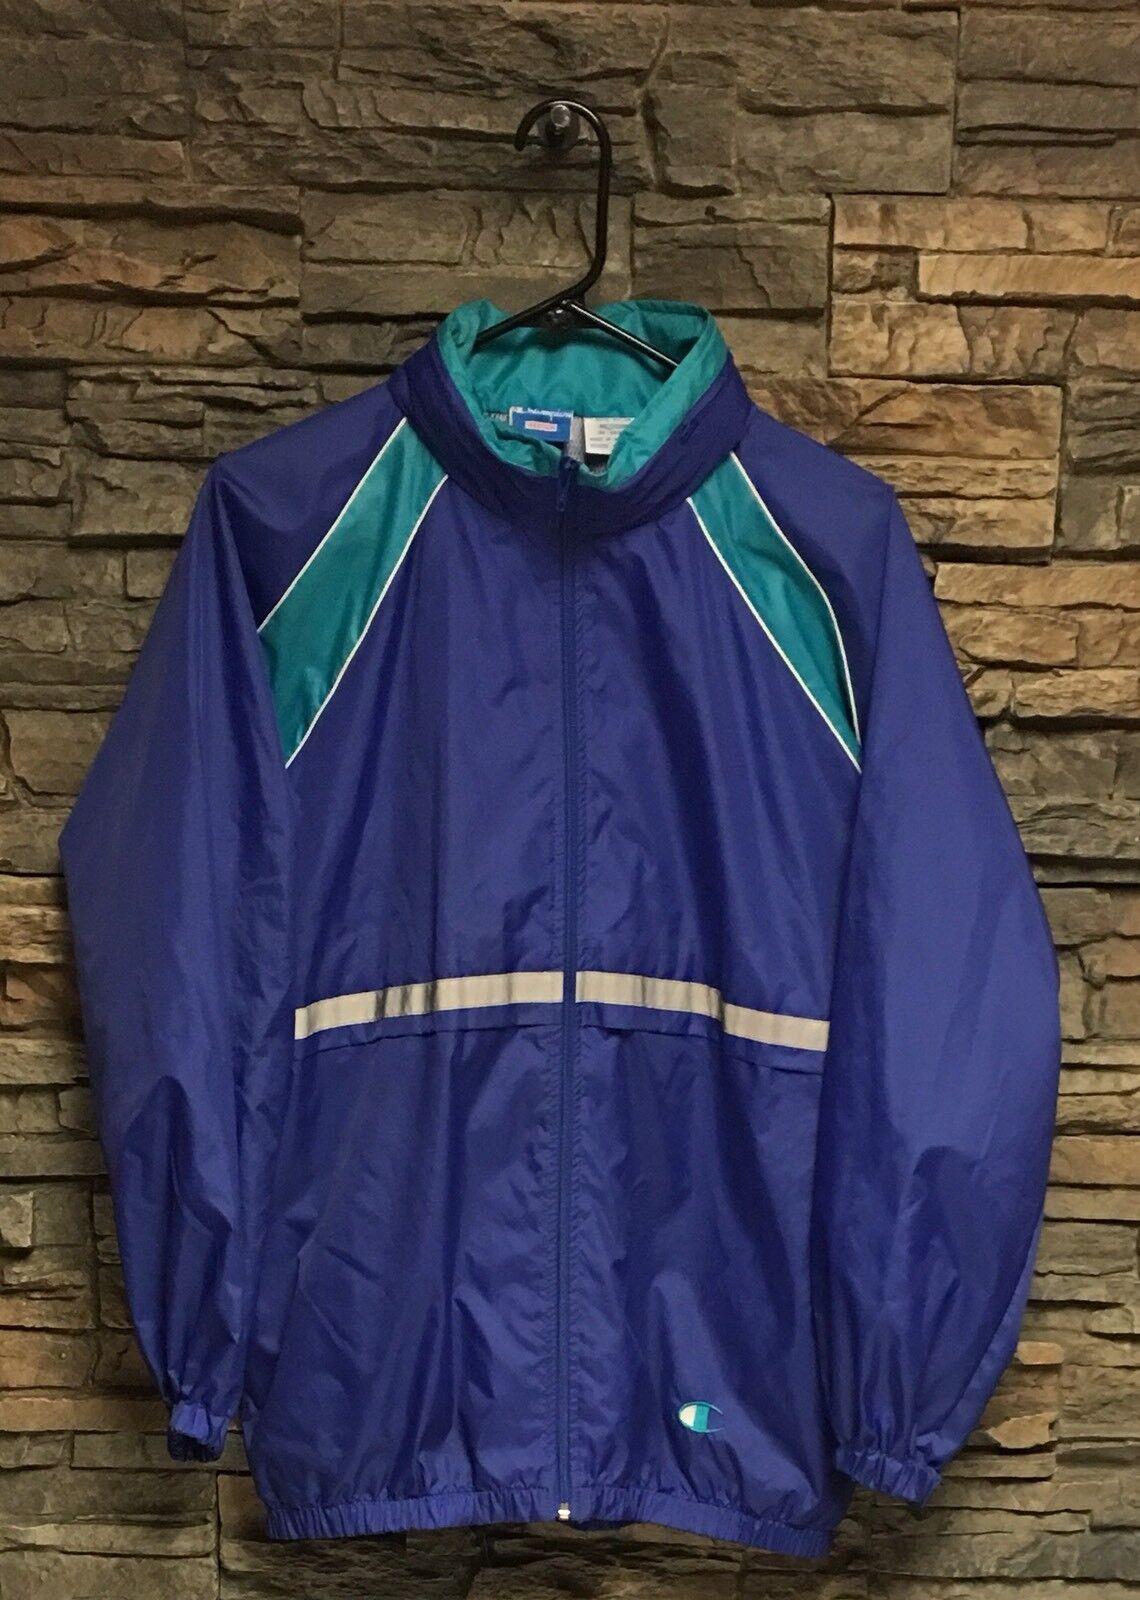 Mens Vtg Champion Windbreaker 80's 90's Reflective Line HideHood Vented bluee Med